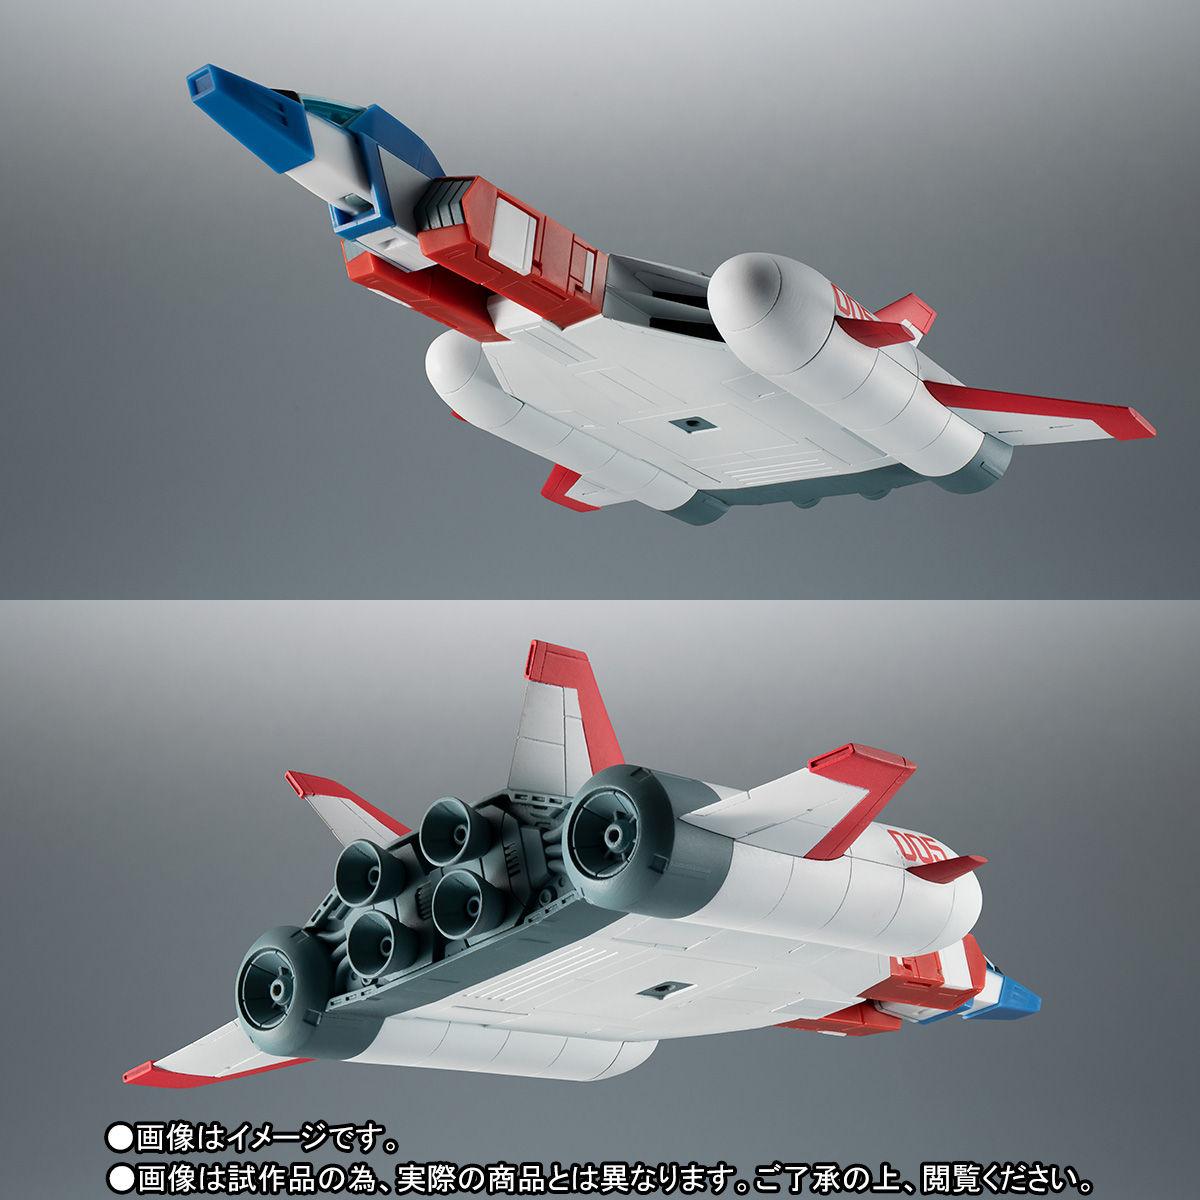 ROBOT魂〈SIDE MS〉『FF-X7-Bst コア・ブースター 2機セット ver. A.N.I.M.E. ~スレッガー005 & セイラ006~』機動戦士ガンダム 可動フィギュア-009